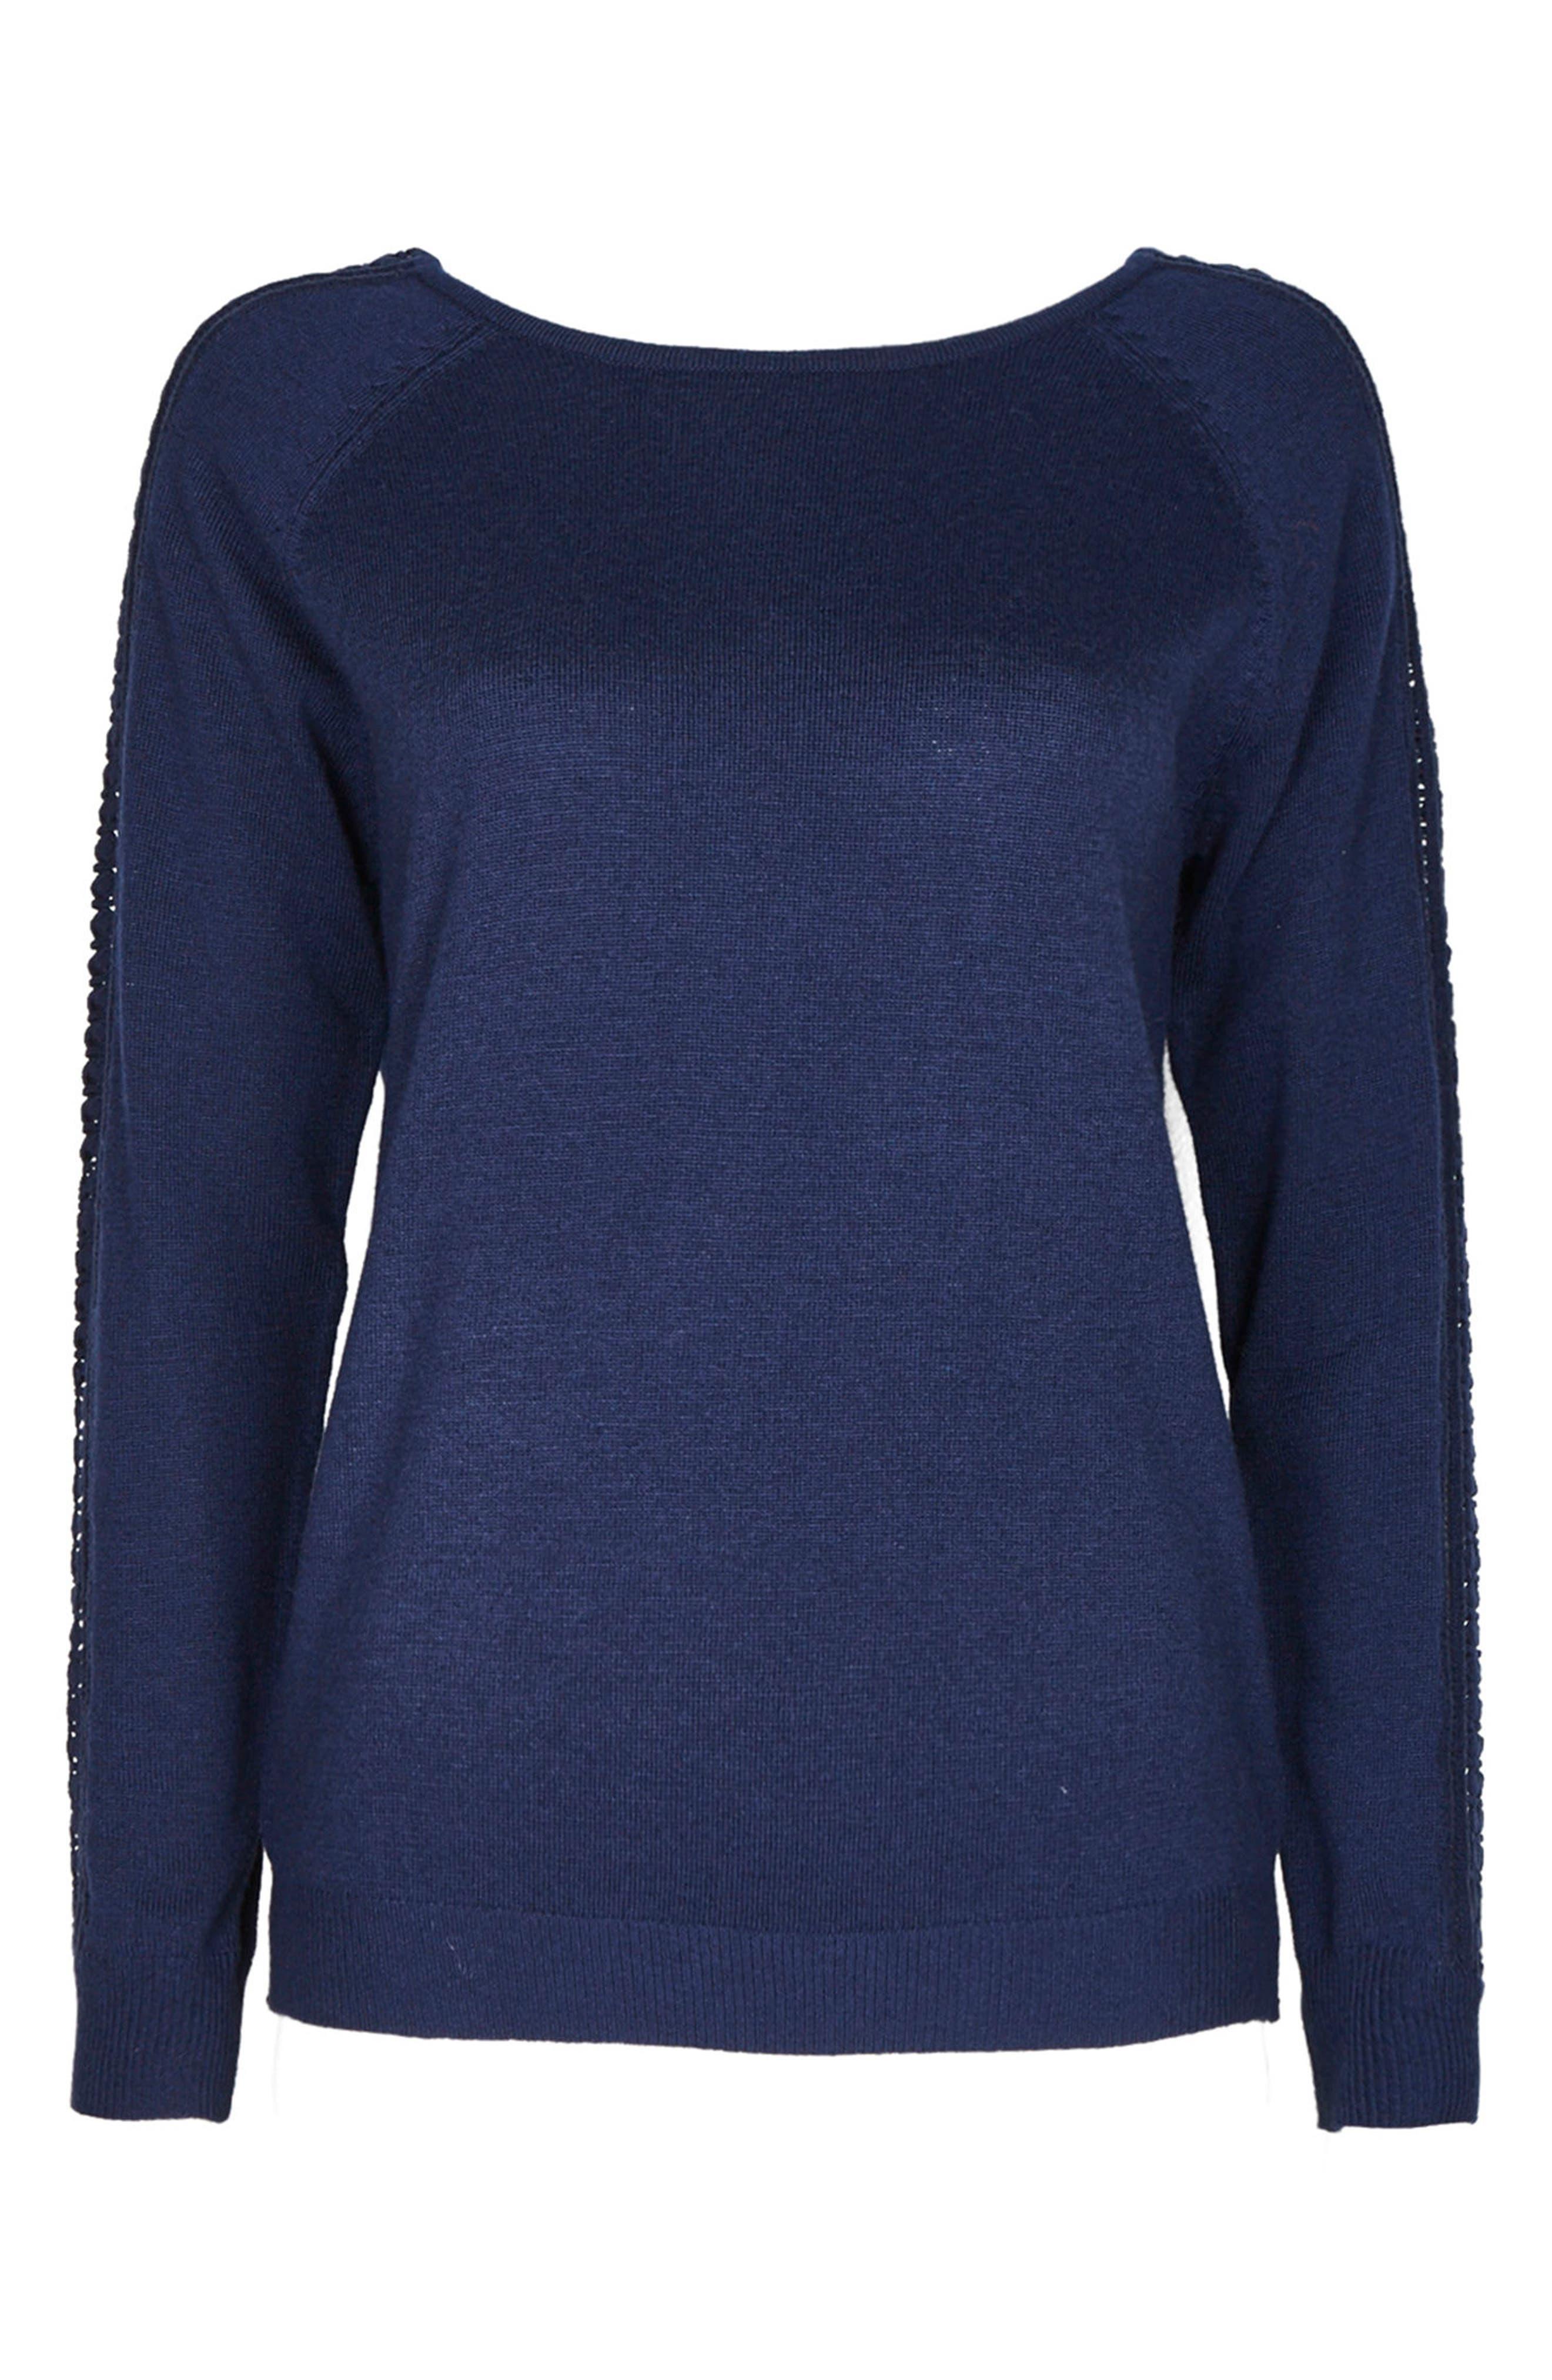 Lace Trim Sweater,                             Main thumbnail 1, color,                             Navy